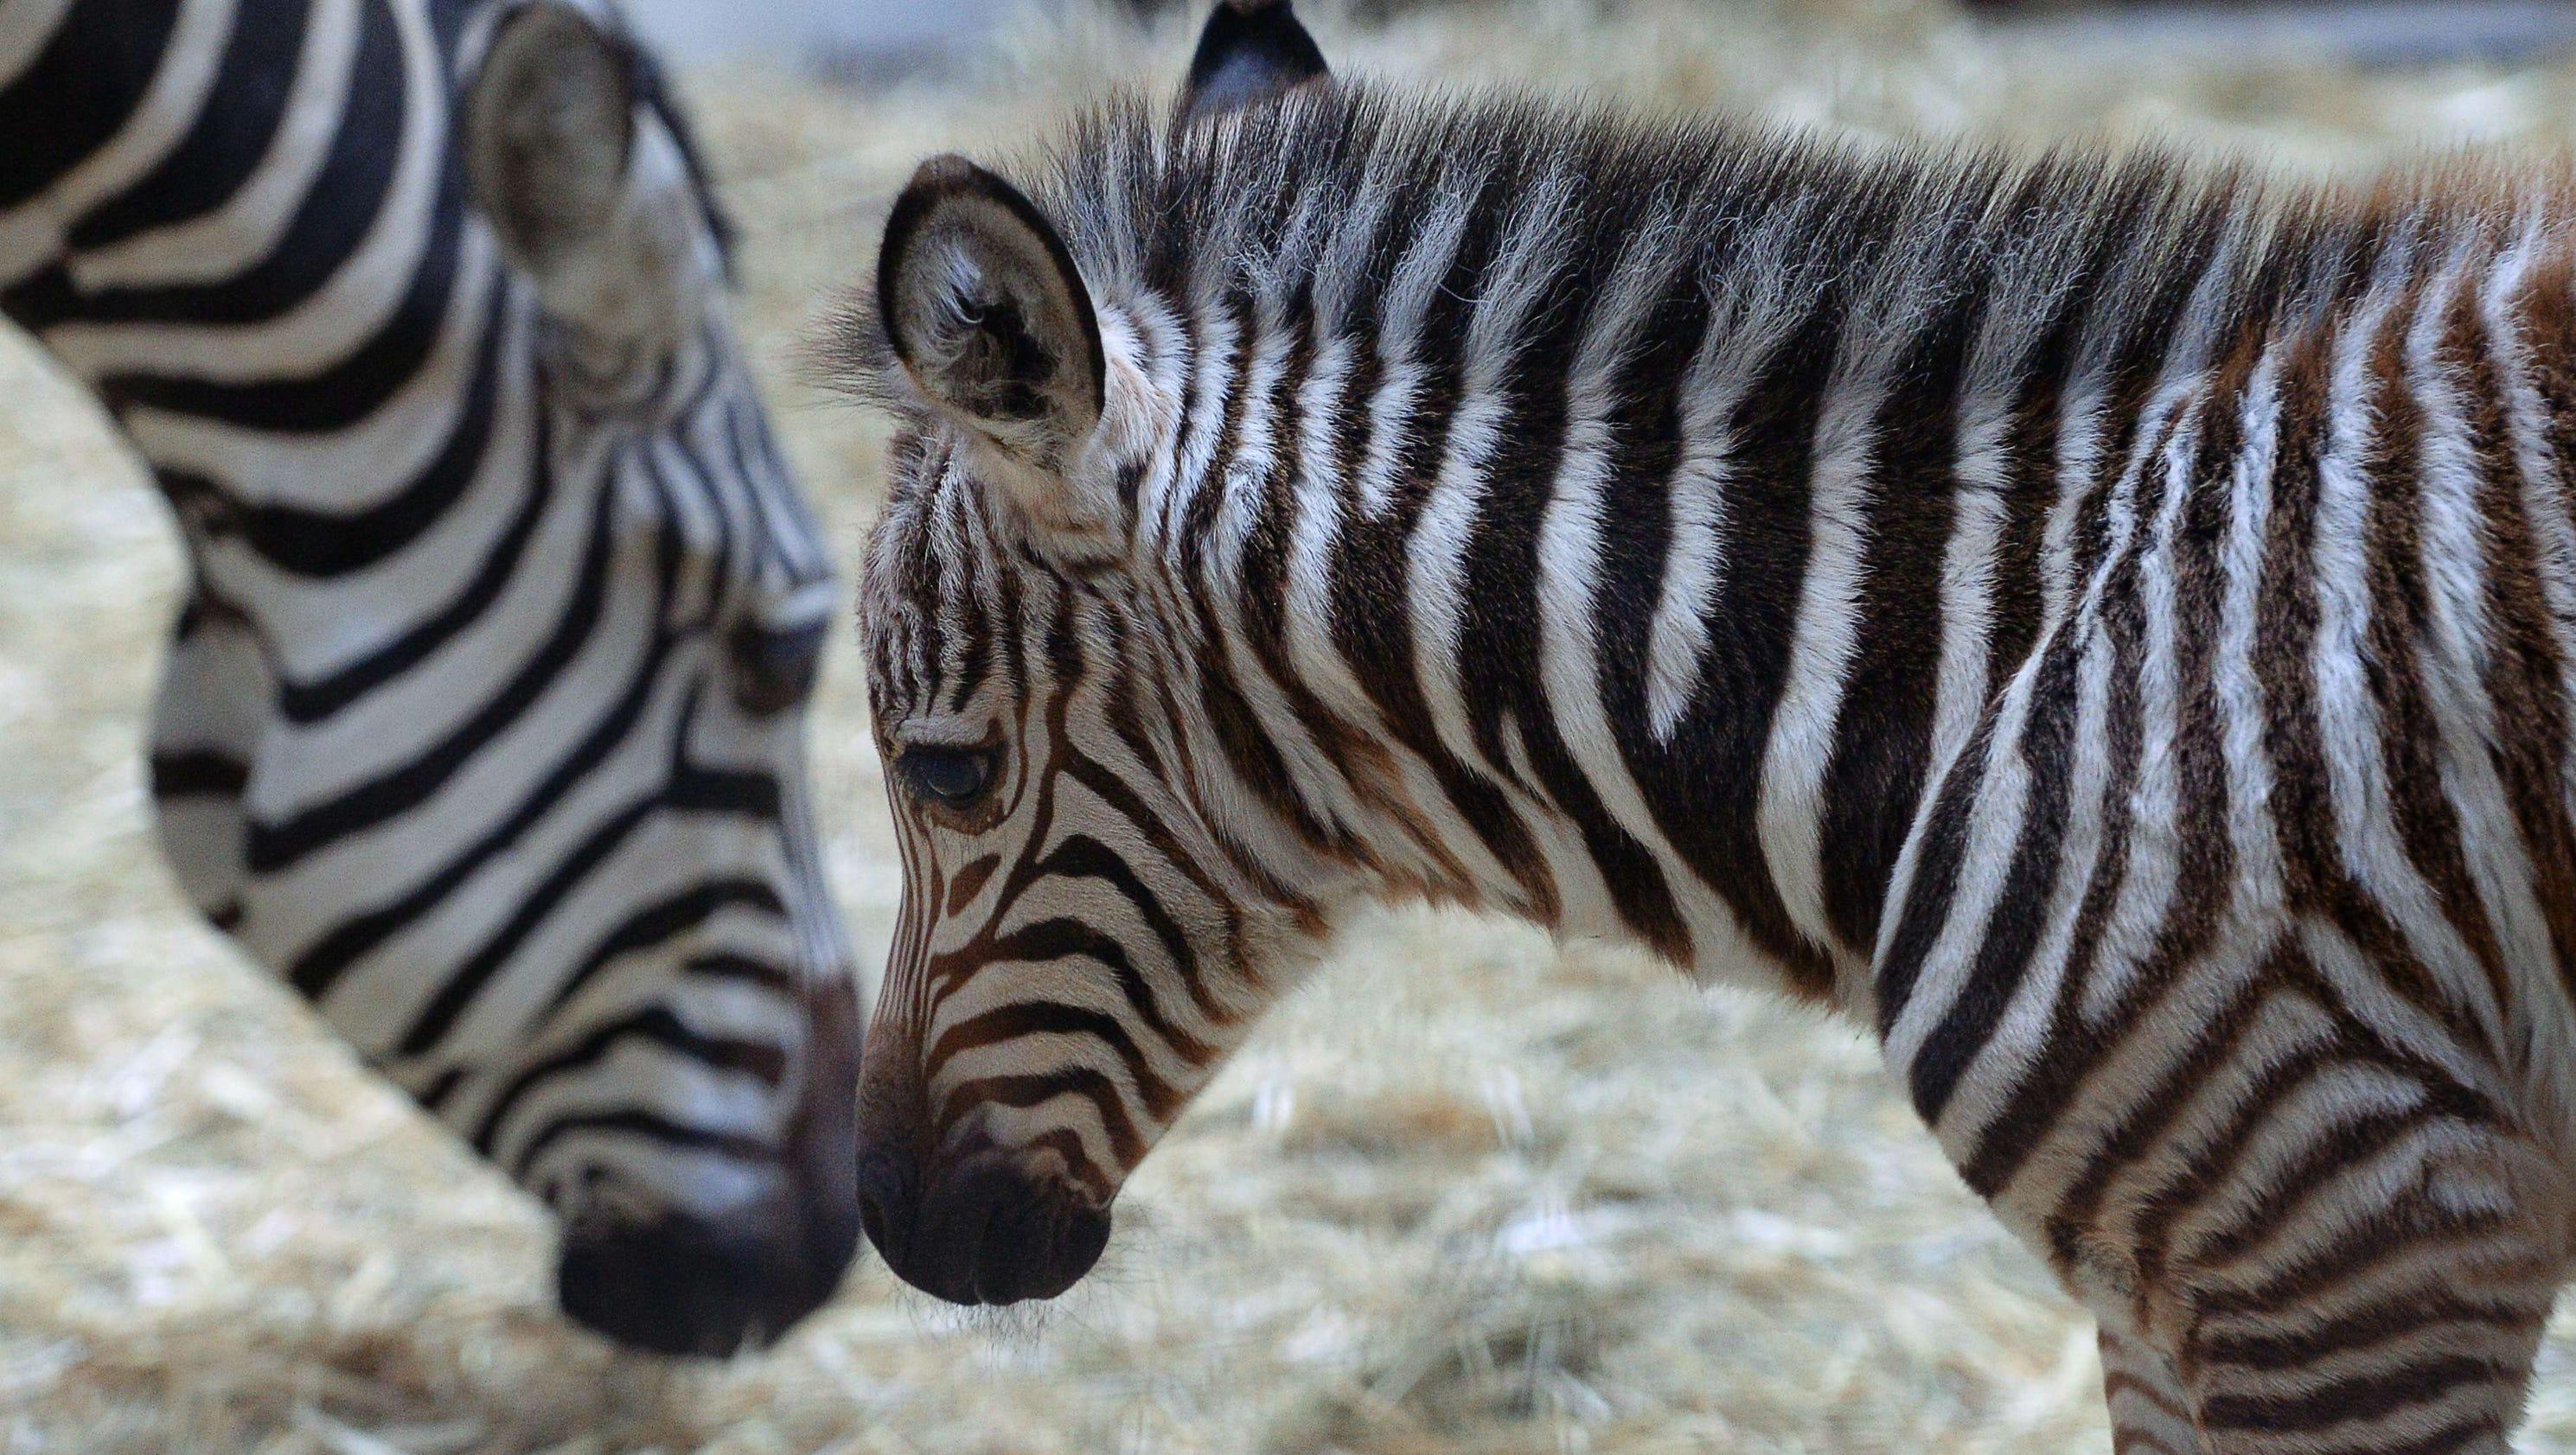 zebra stripes could serve many purposes study finds